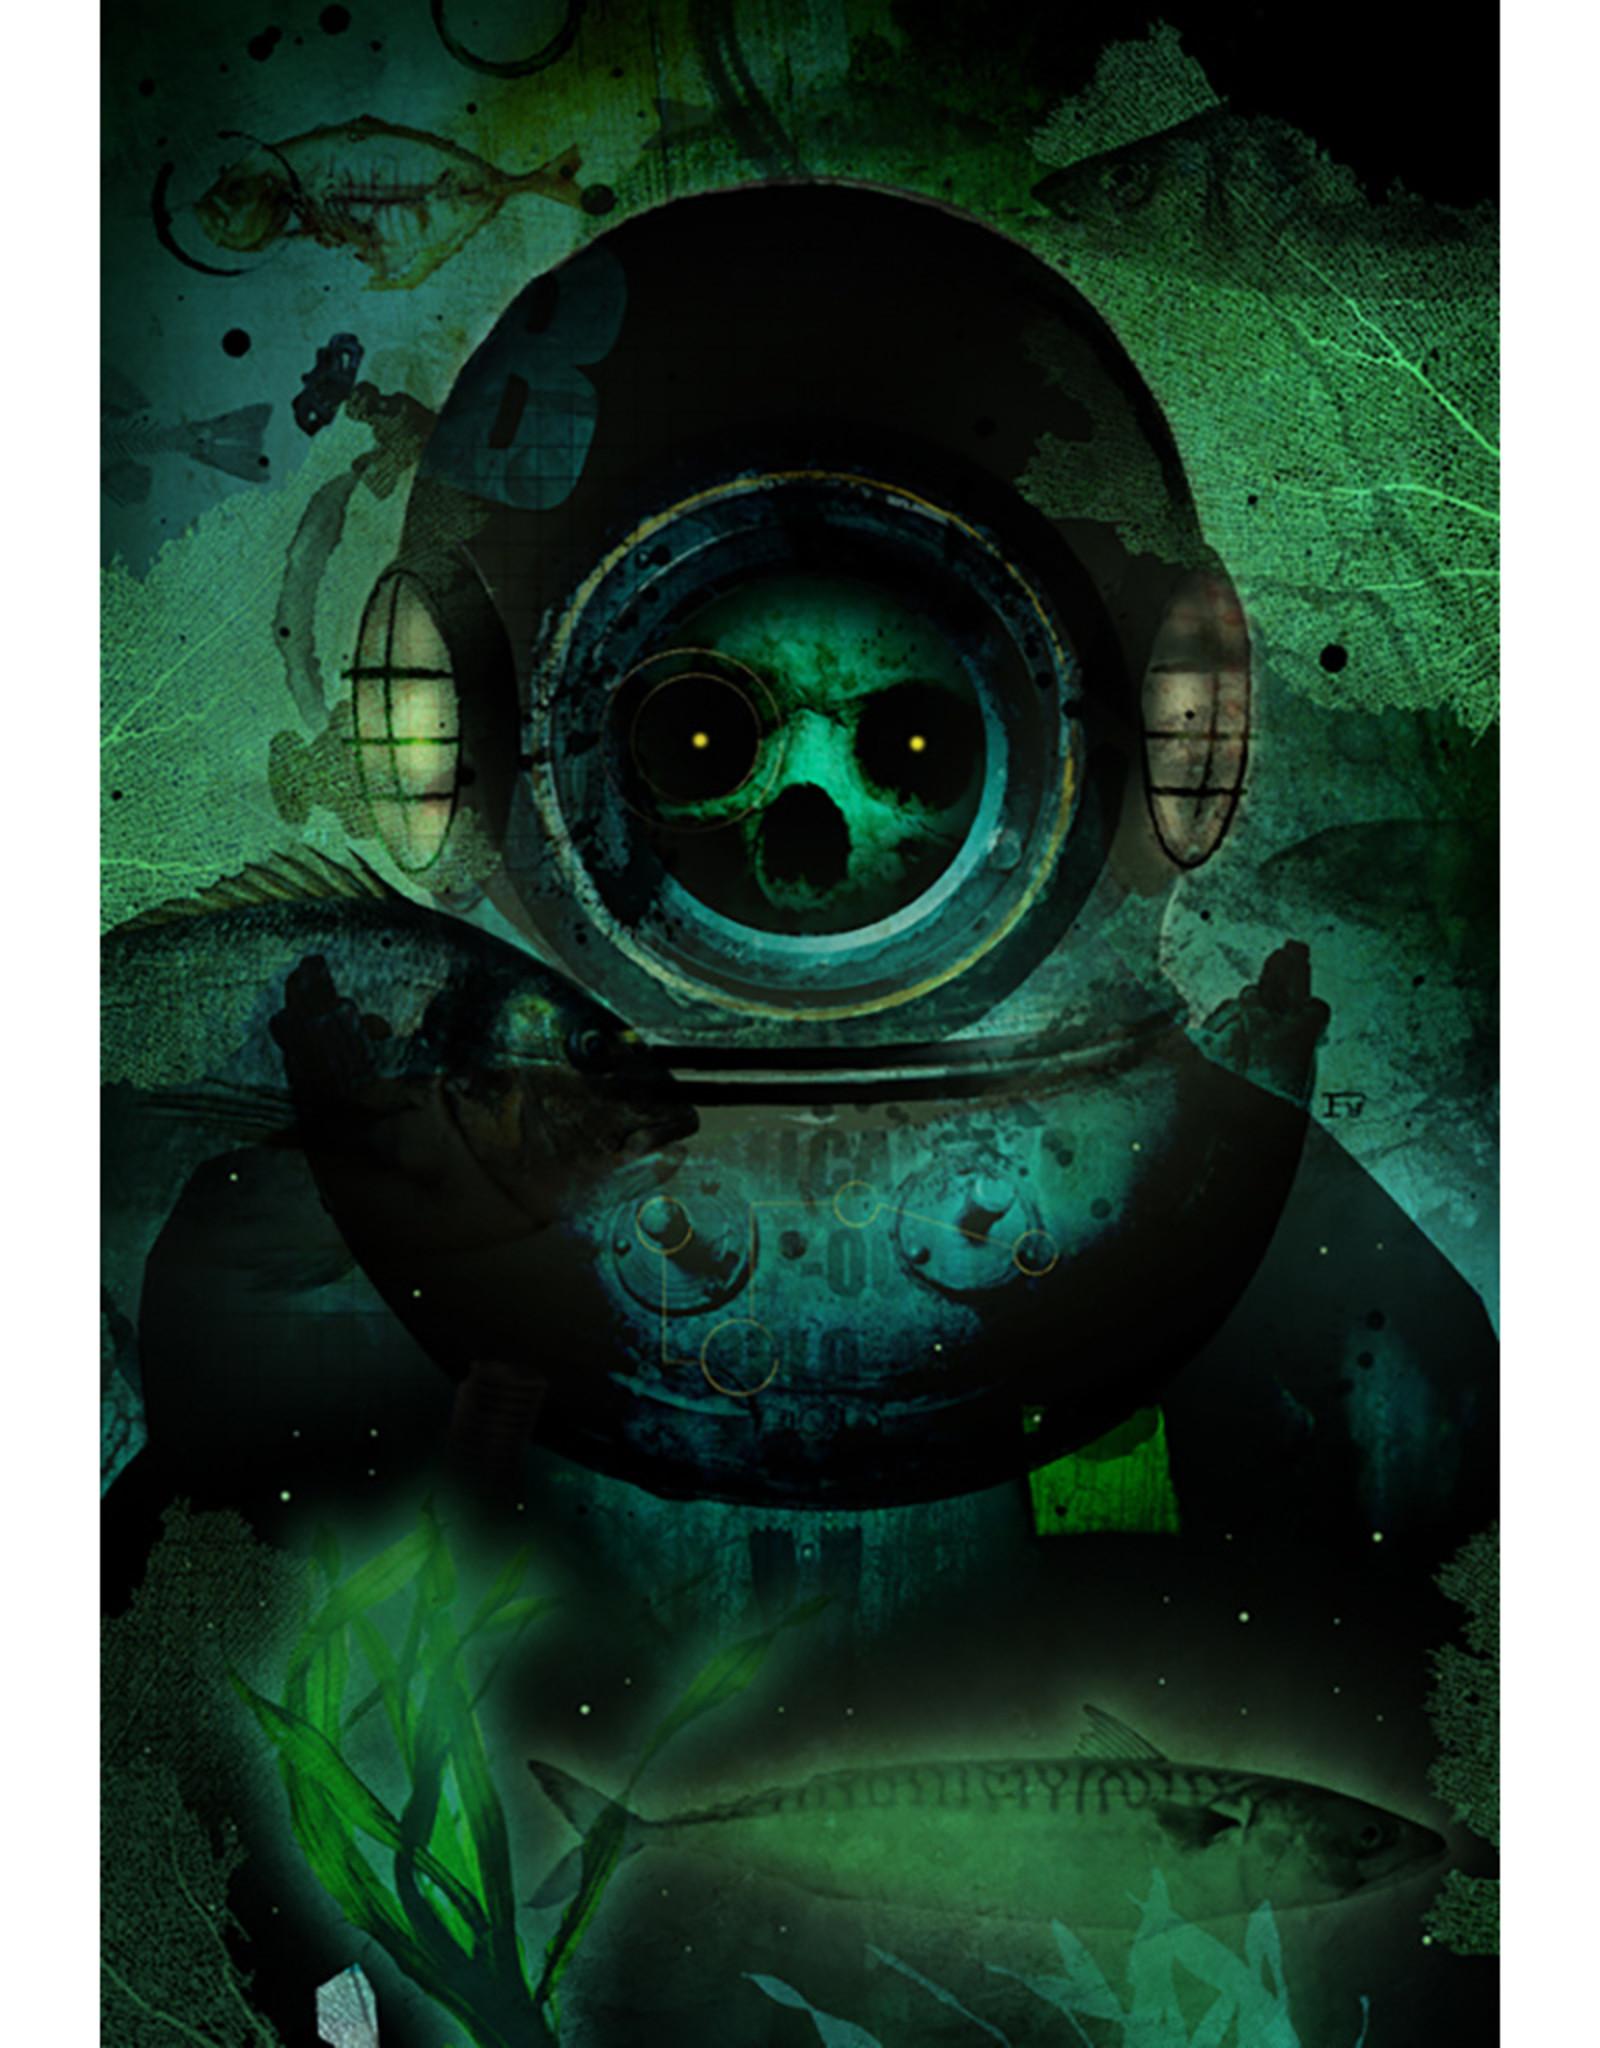 Bryan Fyffe Aquanaut + Cosmonaut Prints // Bryan Fyffe